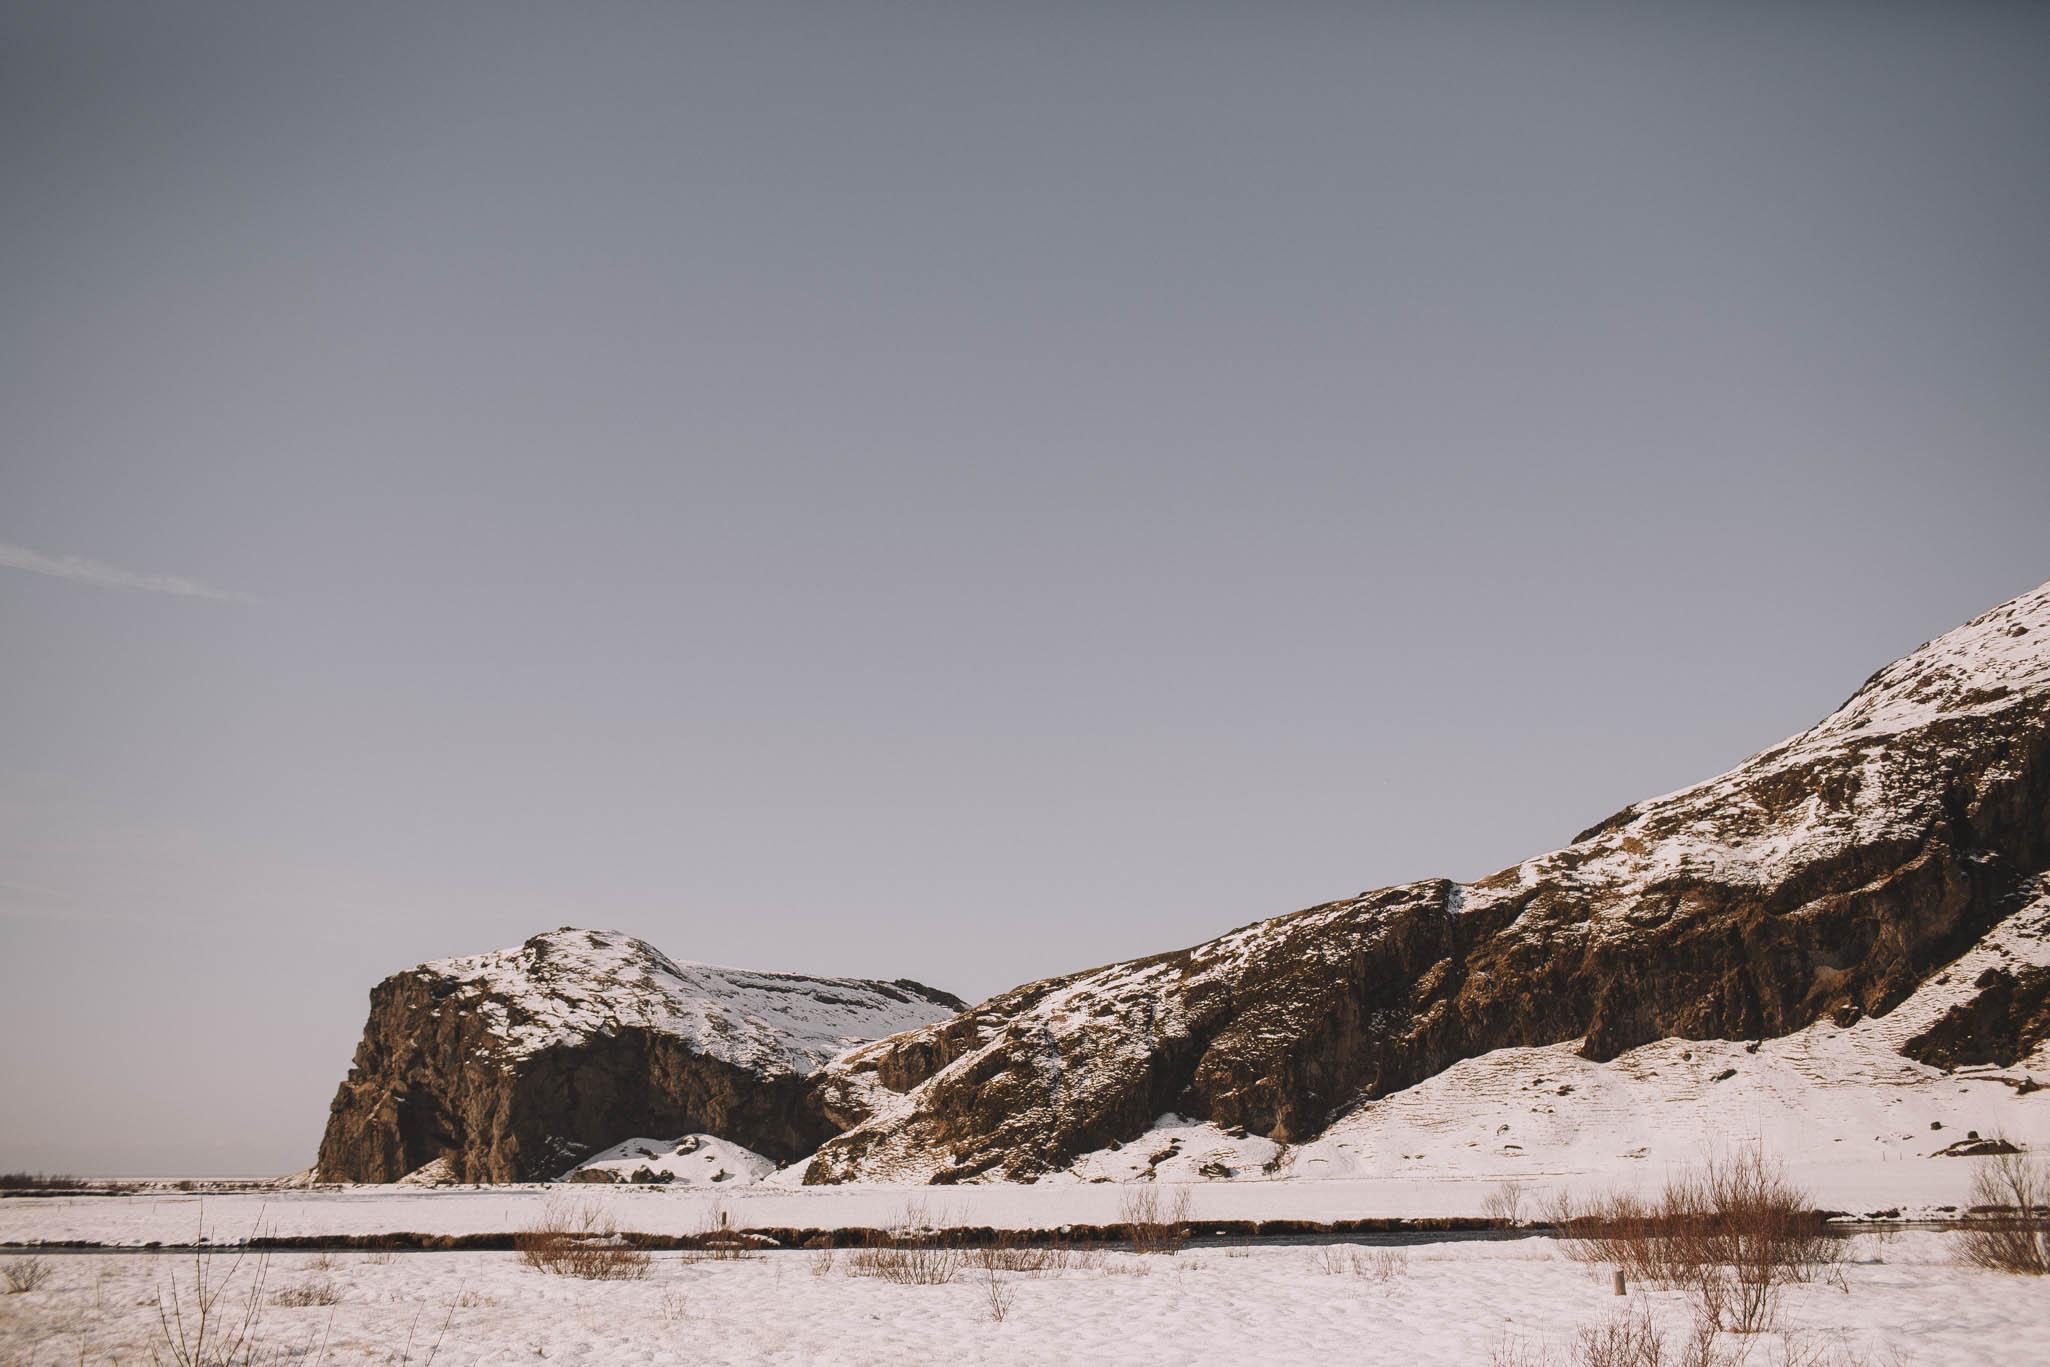 Road-trip-Islande-Iceland-Voyage-Travel-Portrait-Jérémy-Boyer-Sunny-day-Skogafoss-1.jpg